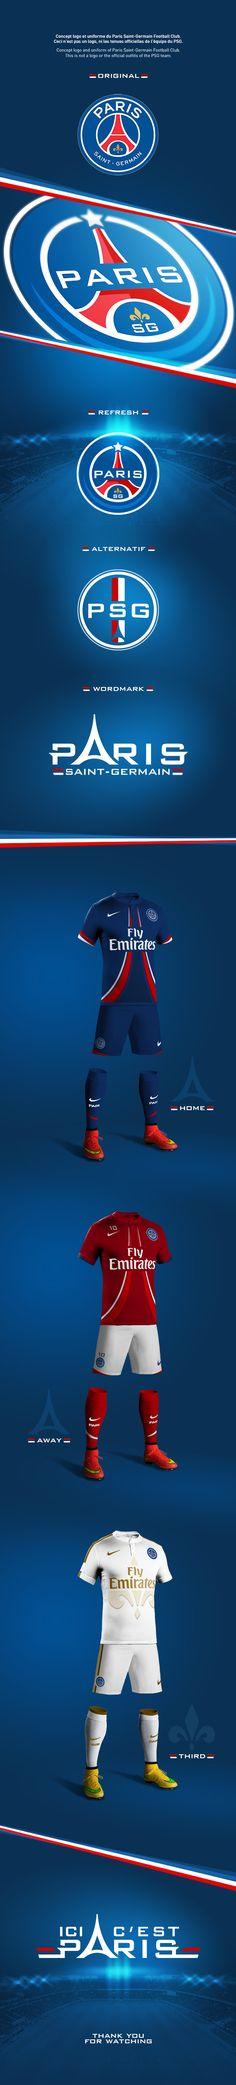 https://www.behance.net/gallery/21982613/Concept-rebrand-PSG-football-club